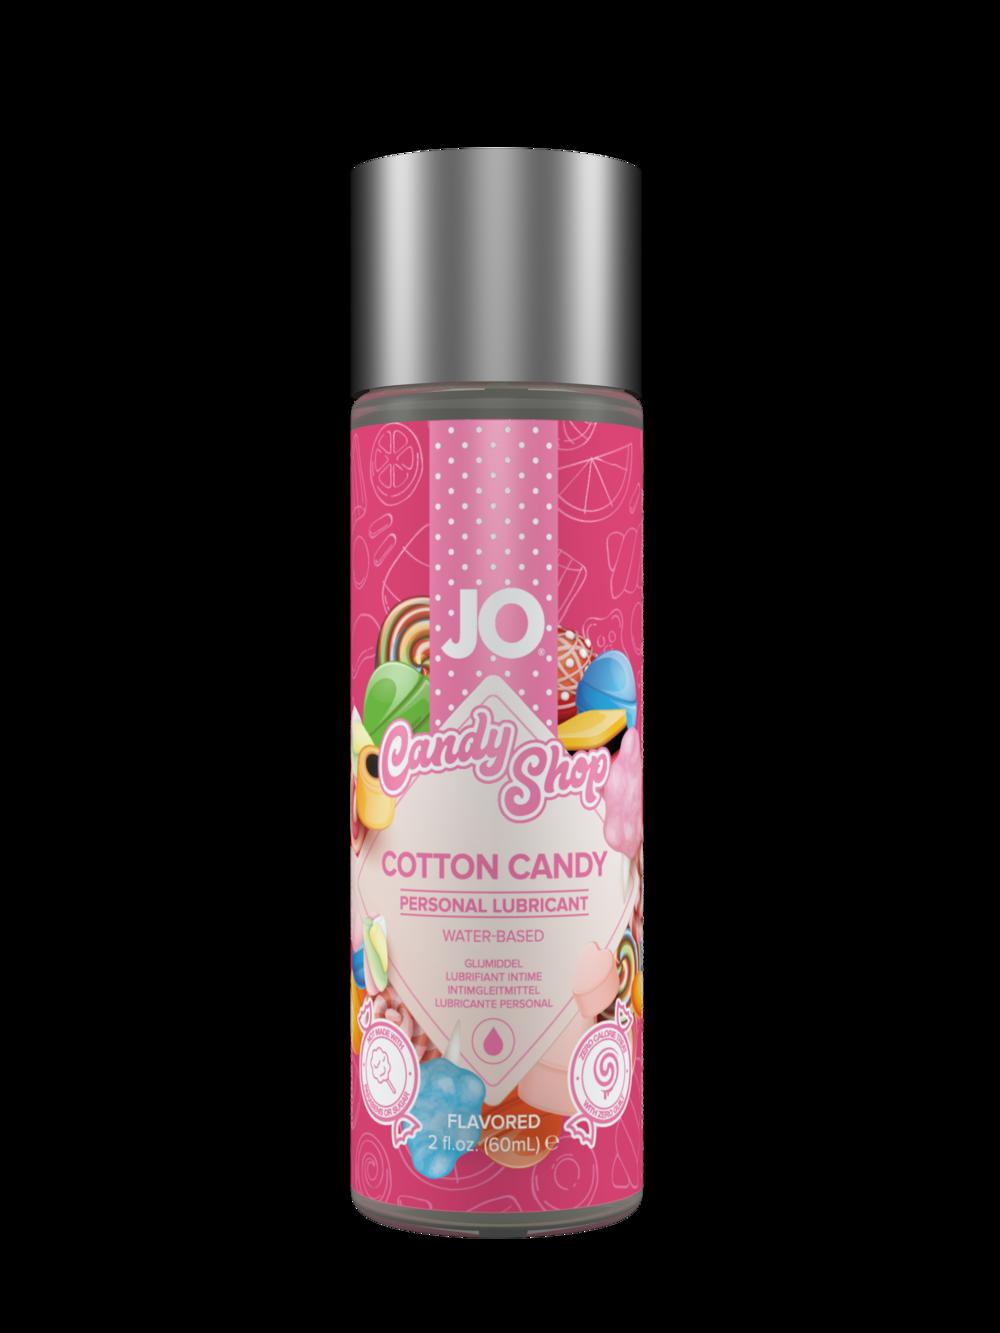 10631 - 4G0631 R0 JO H2O Candy Shop - Cotton Candy- 2 floz 60 mL C.png